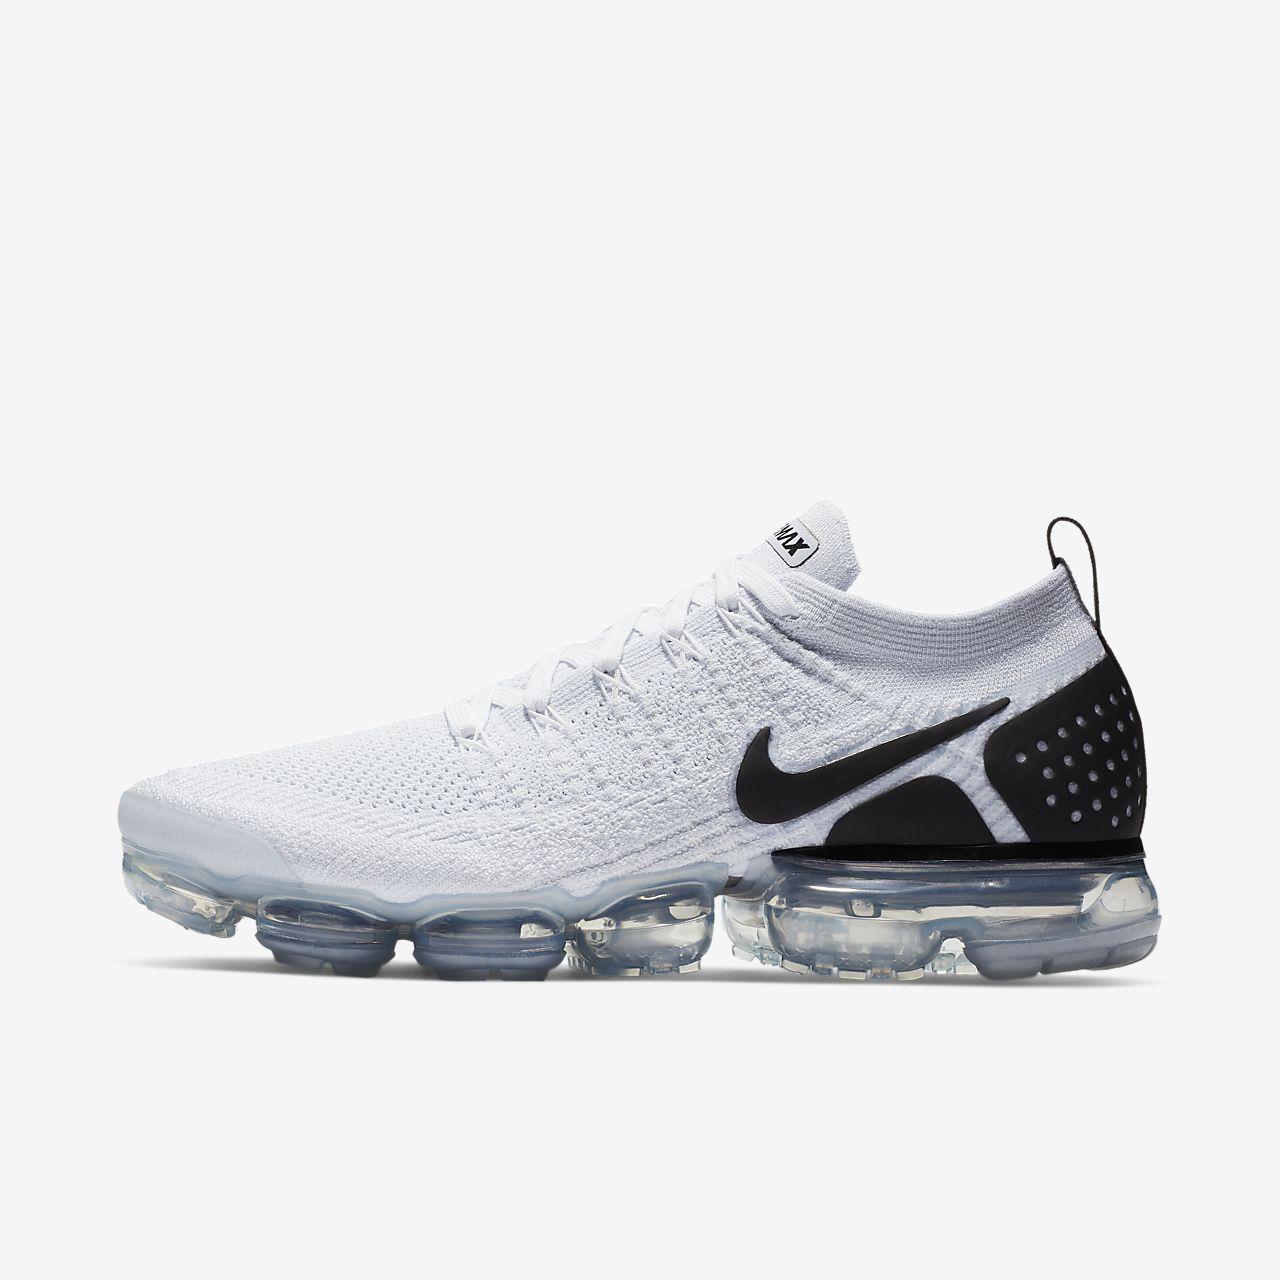 Nike W Nike Air Vapormax Flyknit 2 Bas-tops & Chaussures Dz8Ec